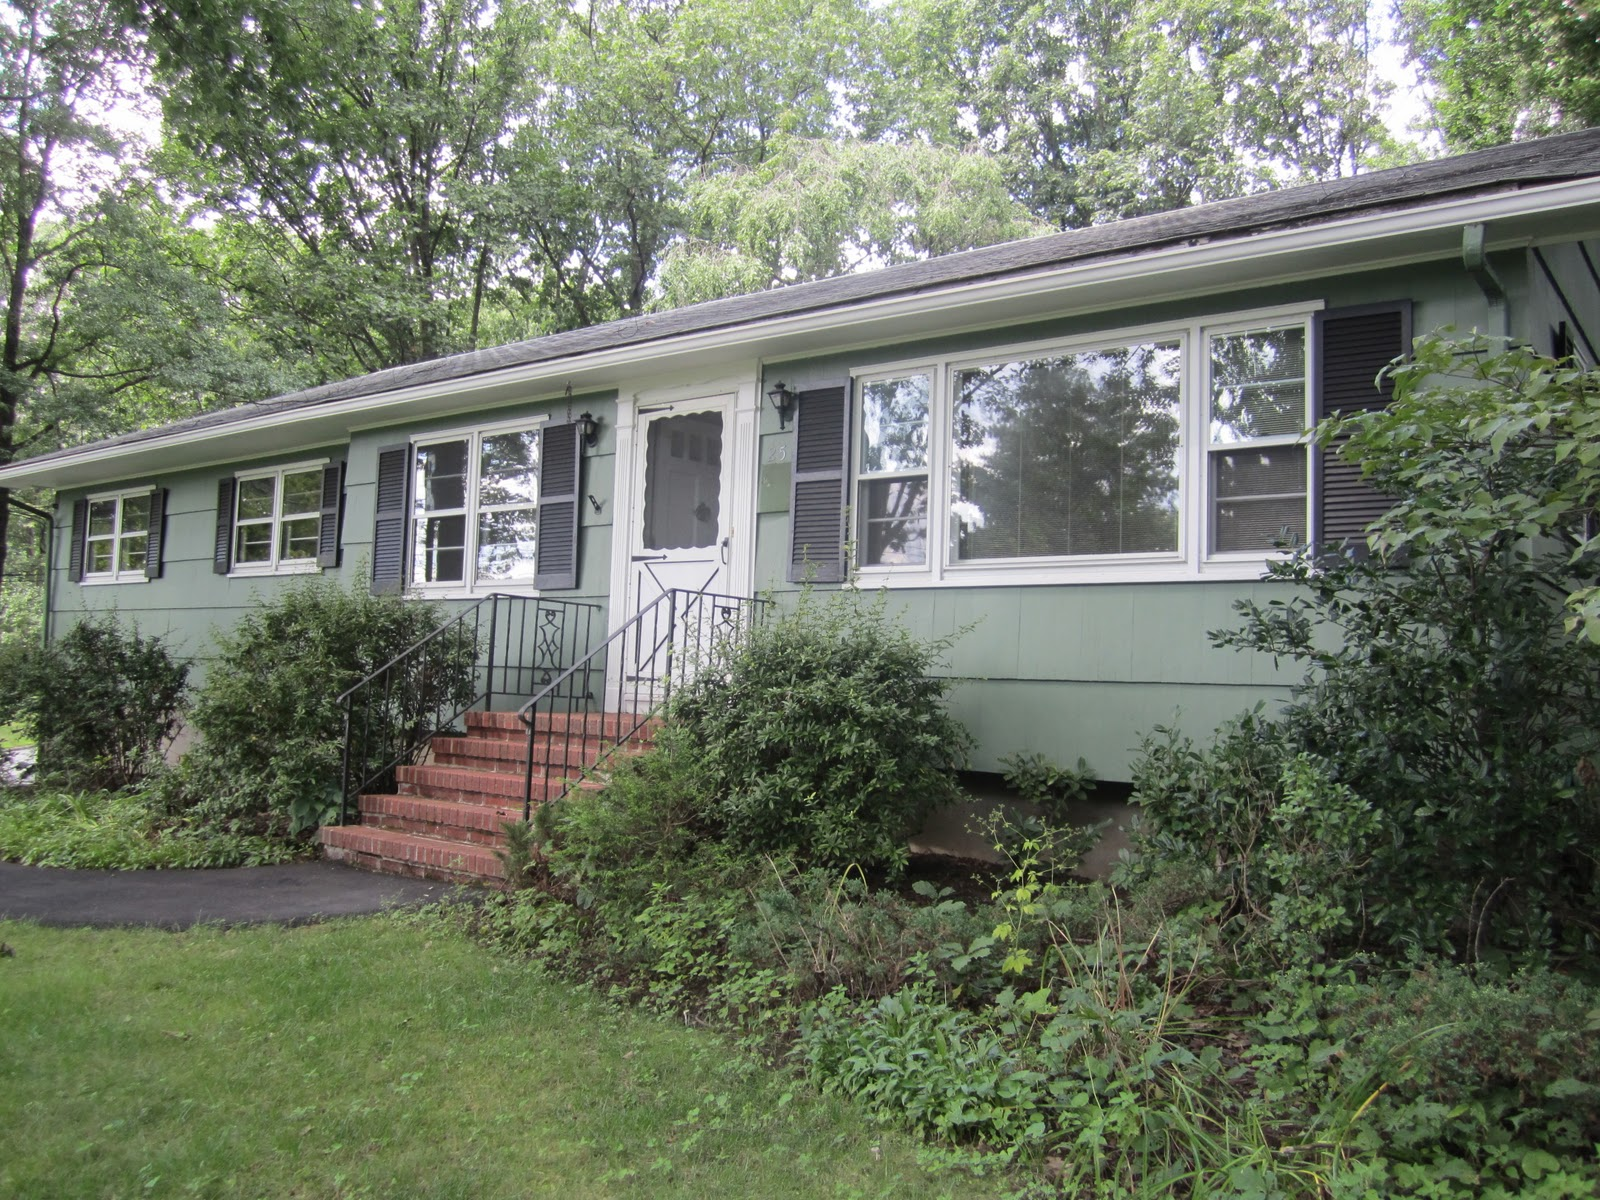 Split Level House Backyard Zion Star Zion Star